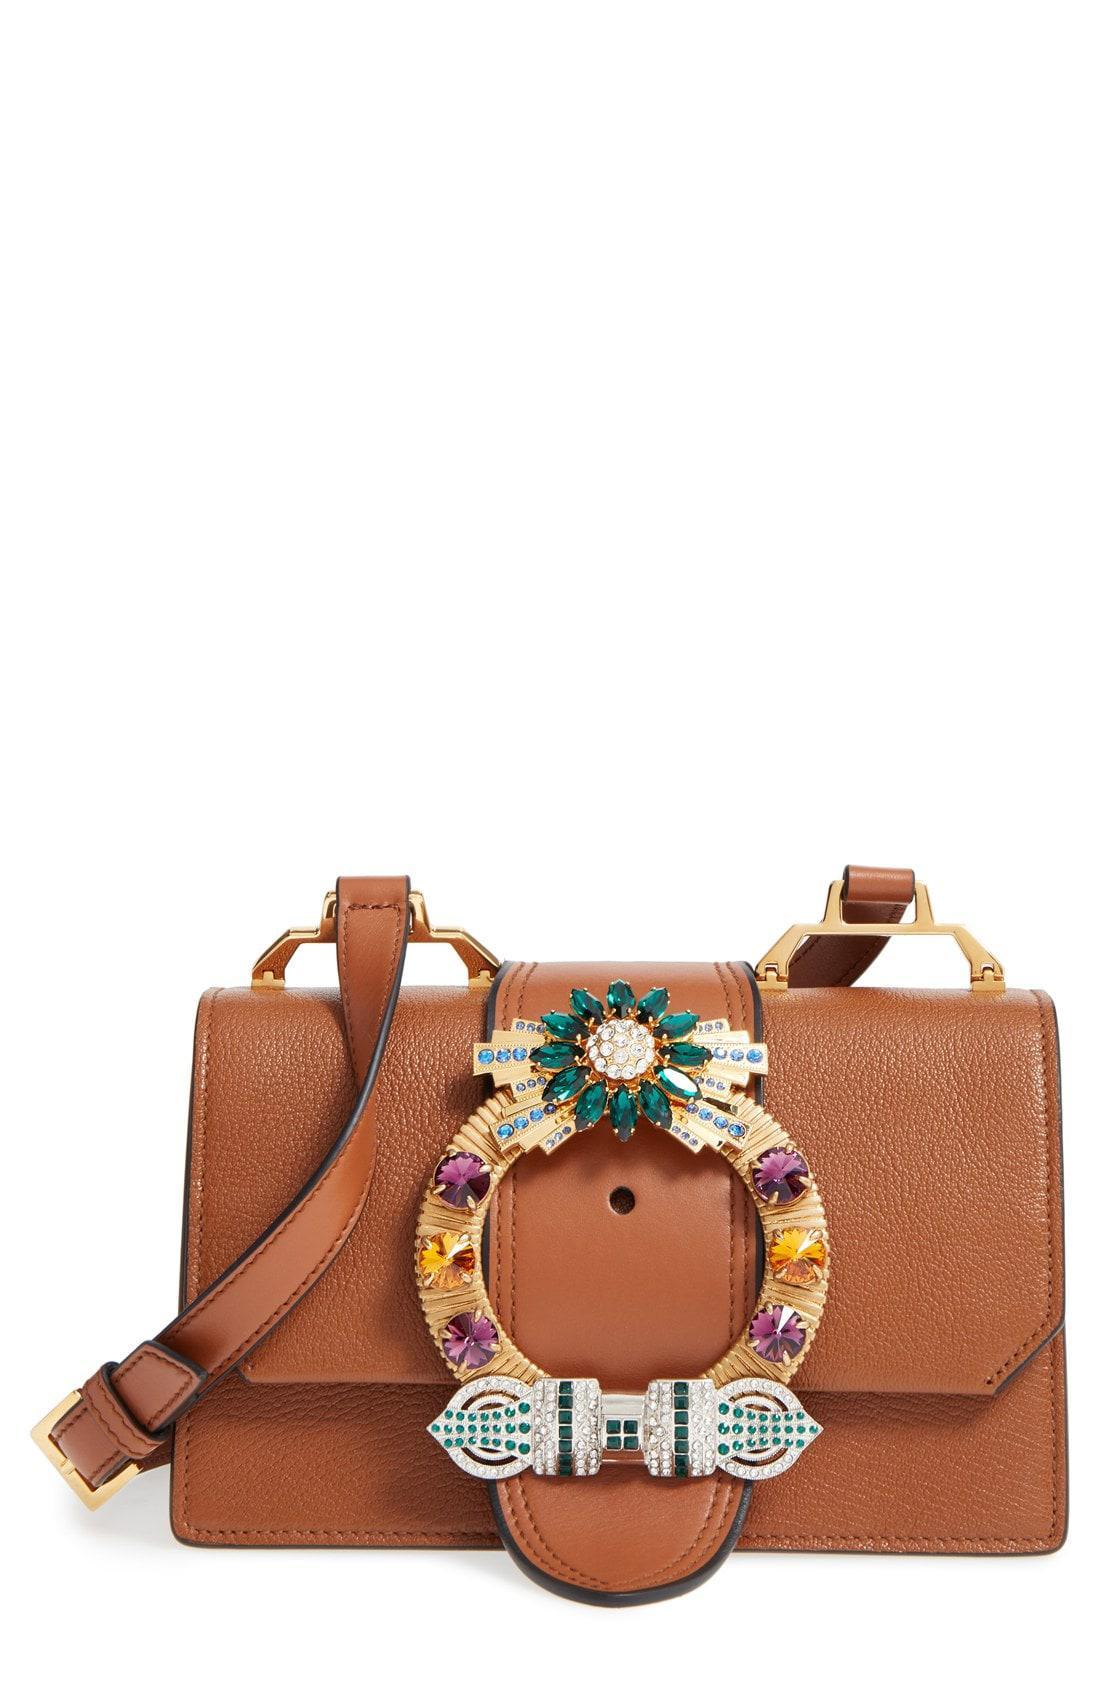 98d6f688fdc0 Miu Miu. Women s Brown  small Madras  Crystal Embellished Leather Shoulder  Bag